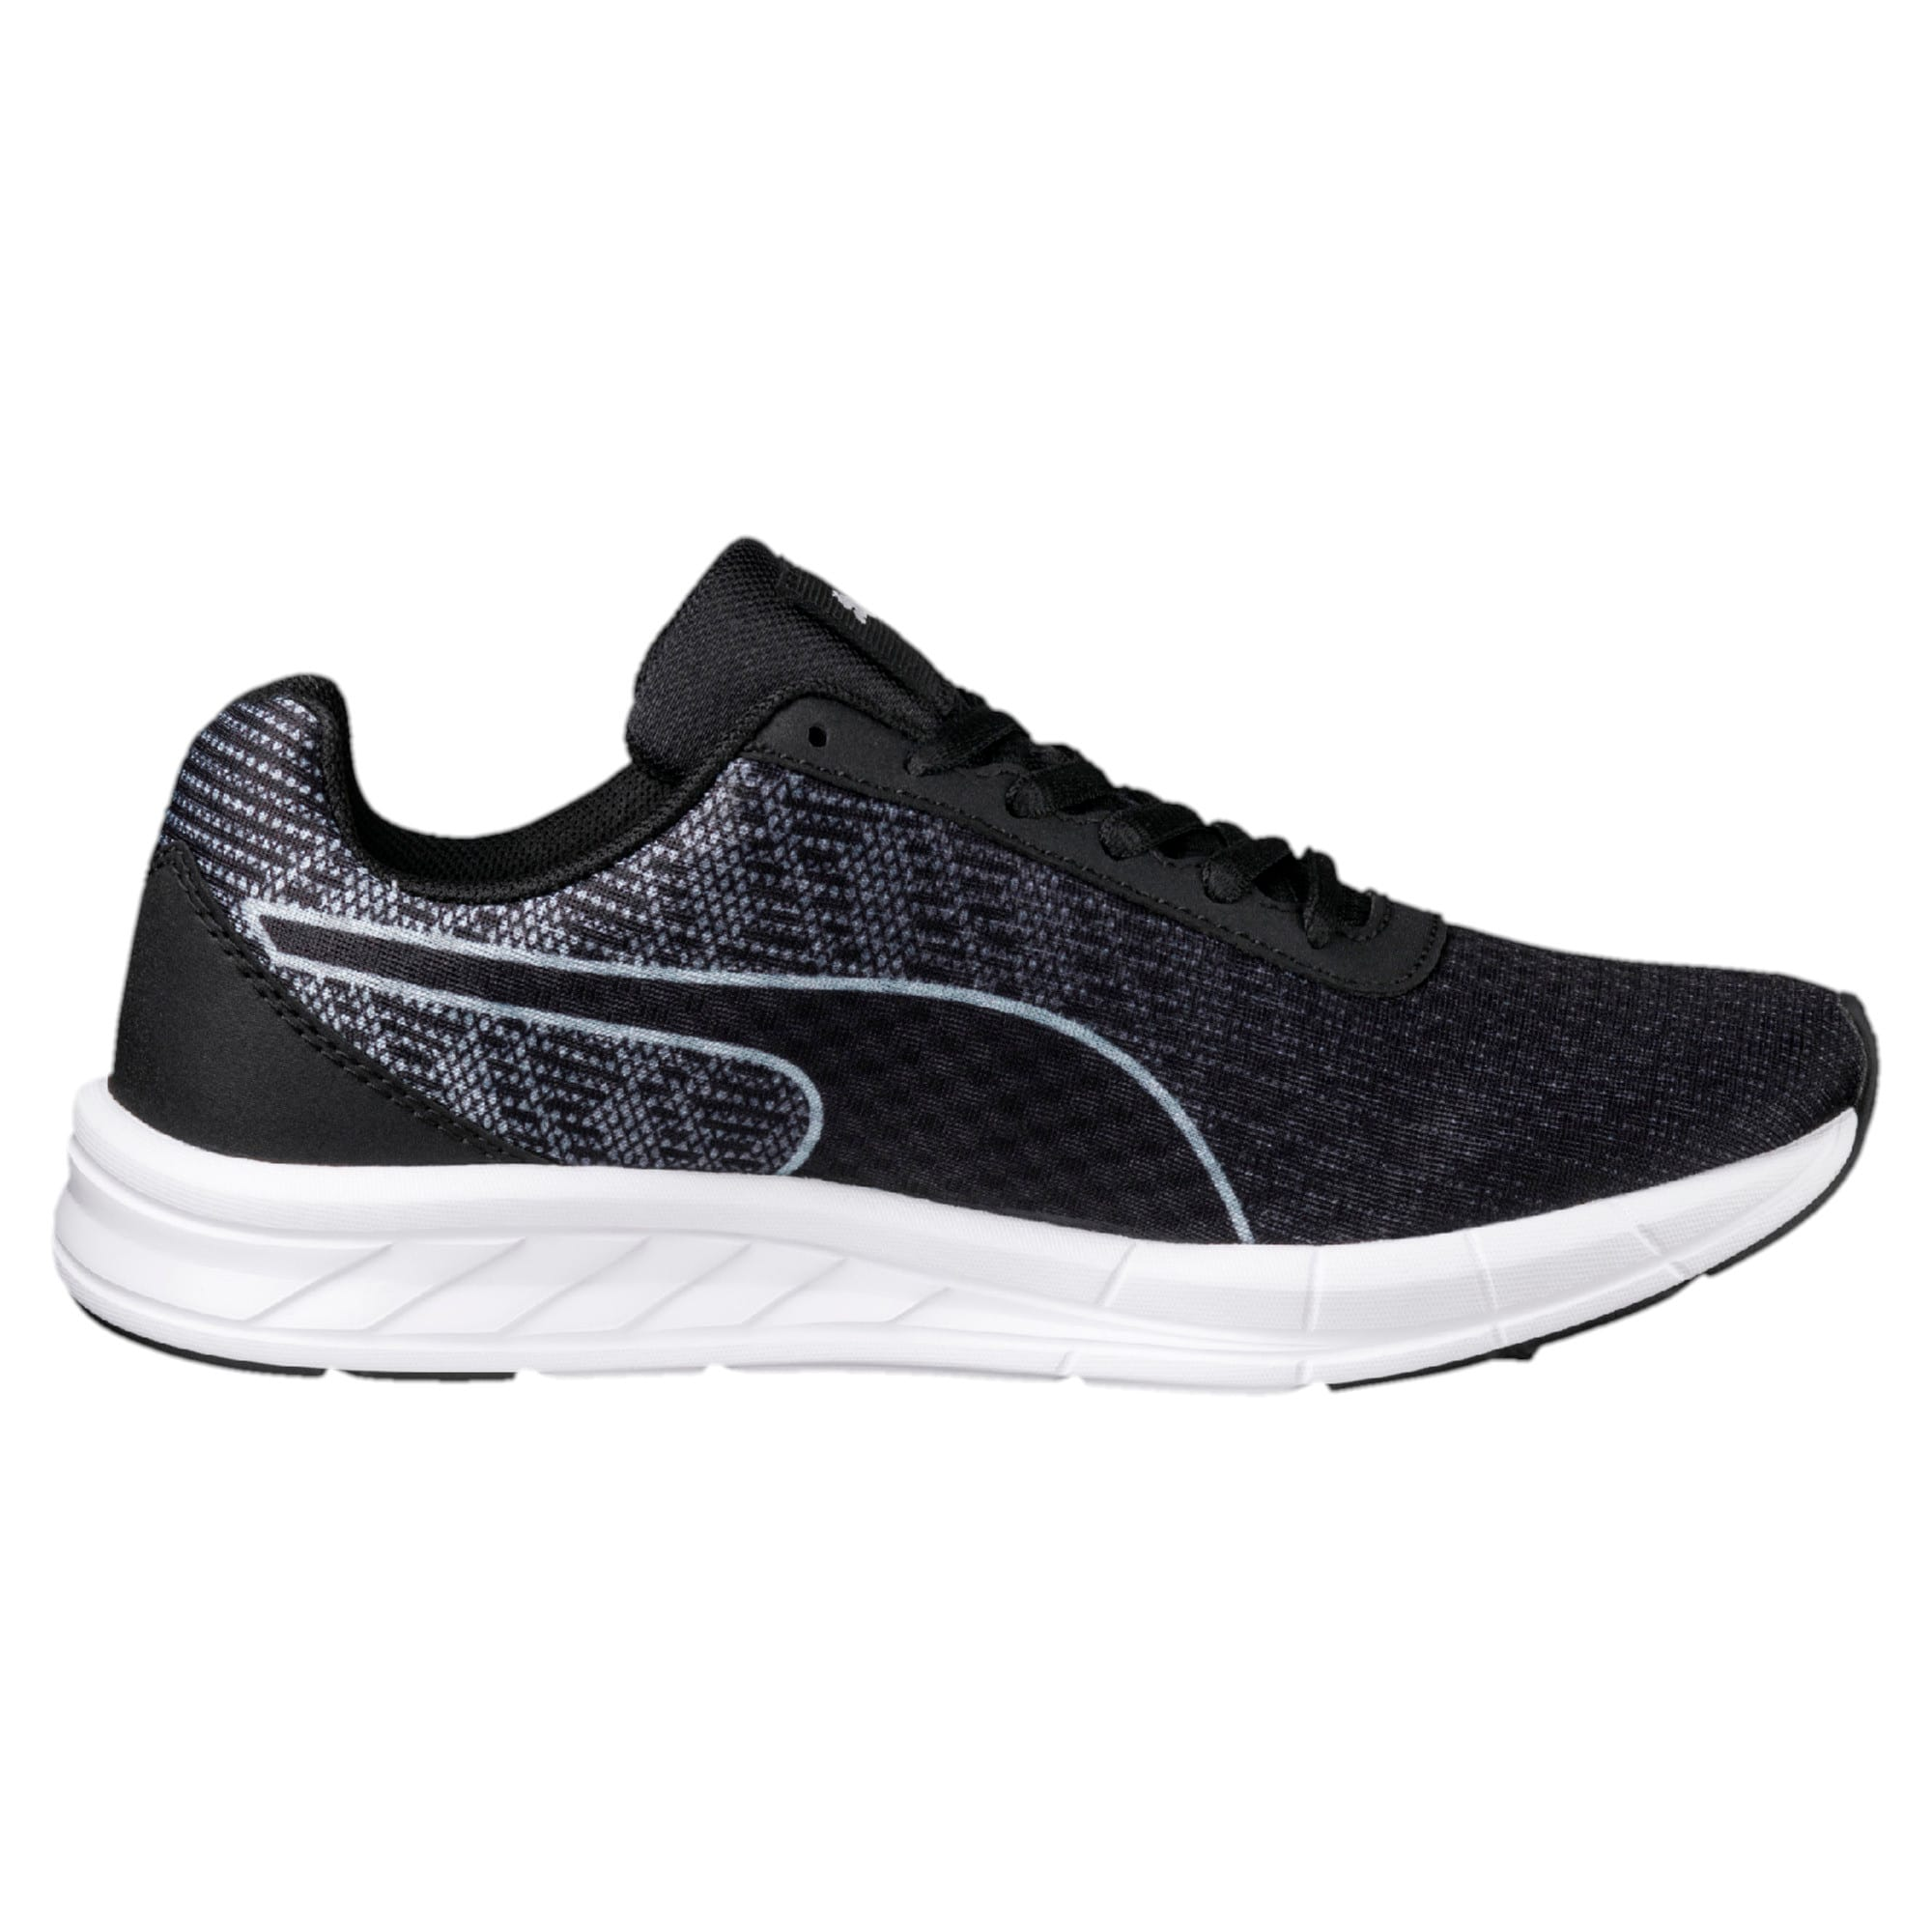 Thumbnail 5 of Comet Kids' Running Shoes, Quarry-Puma Black, medium-IND